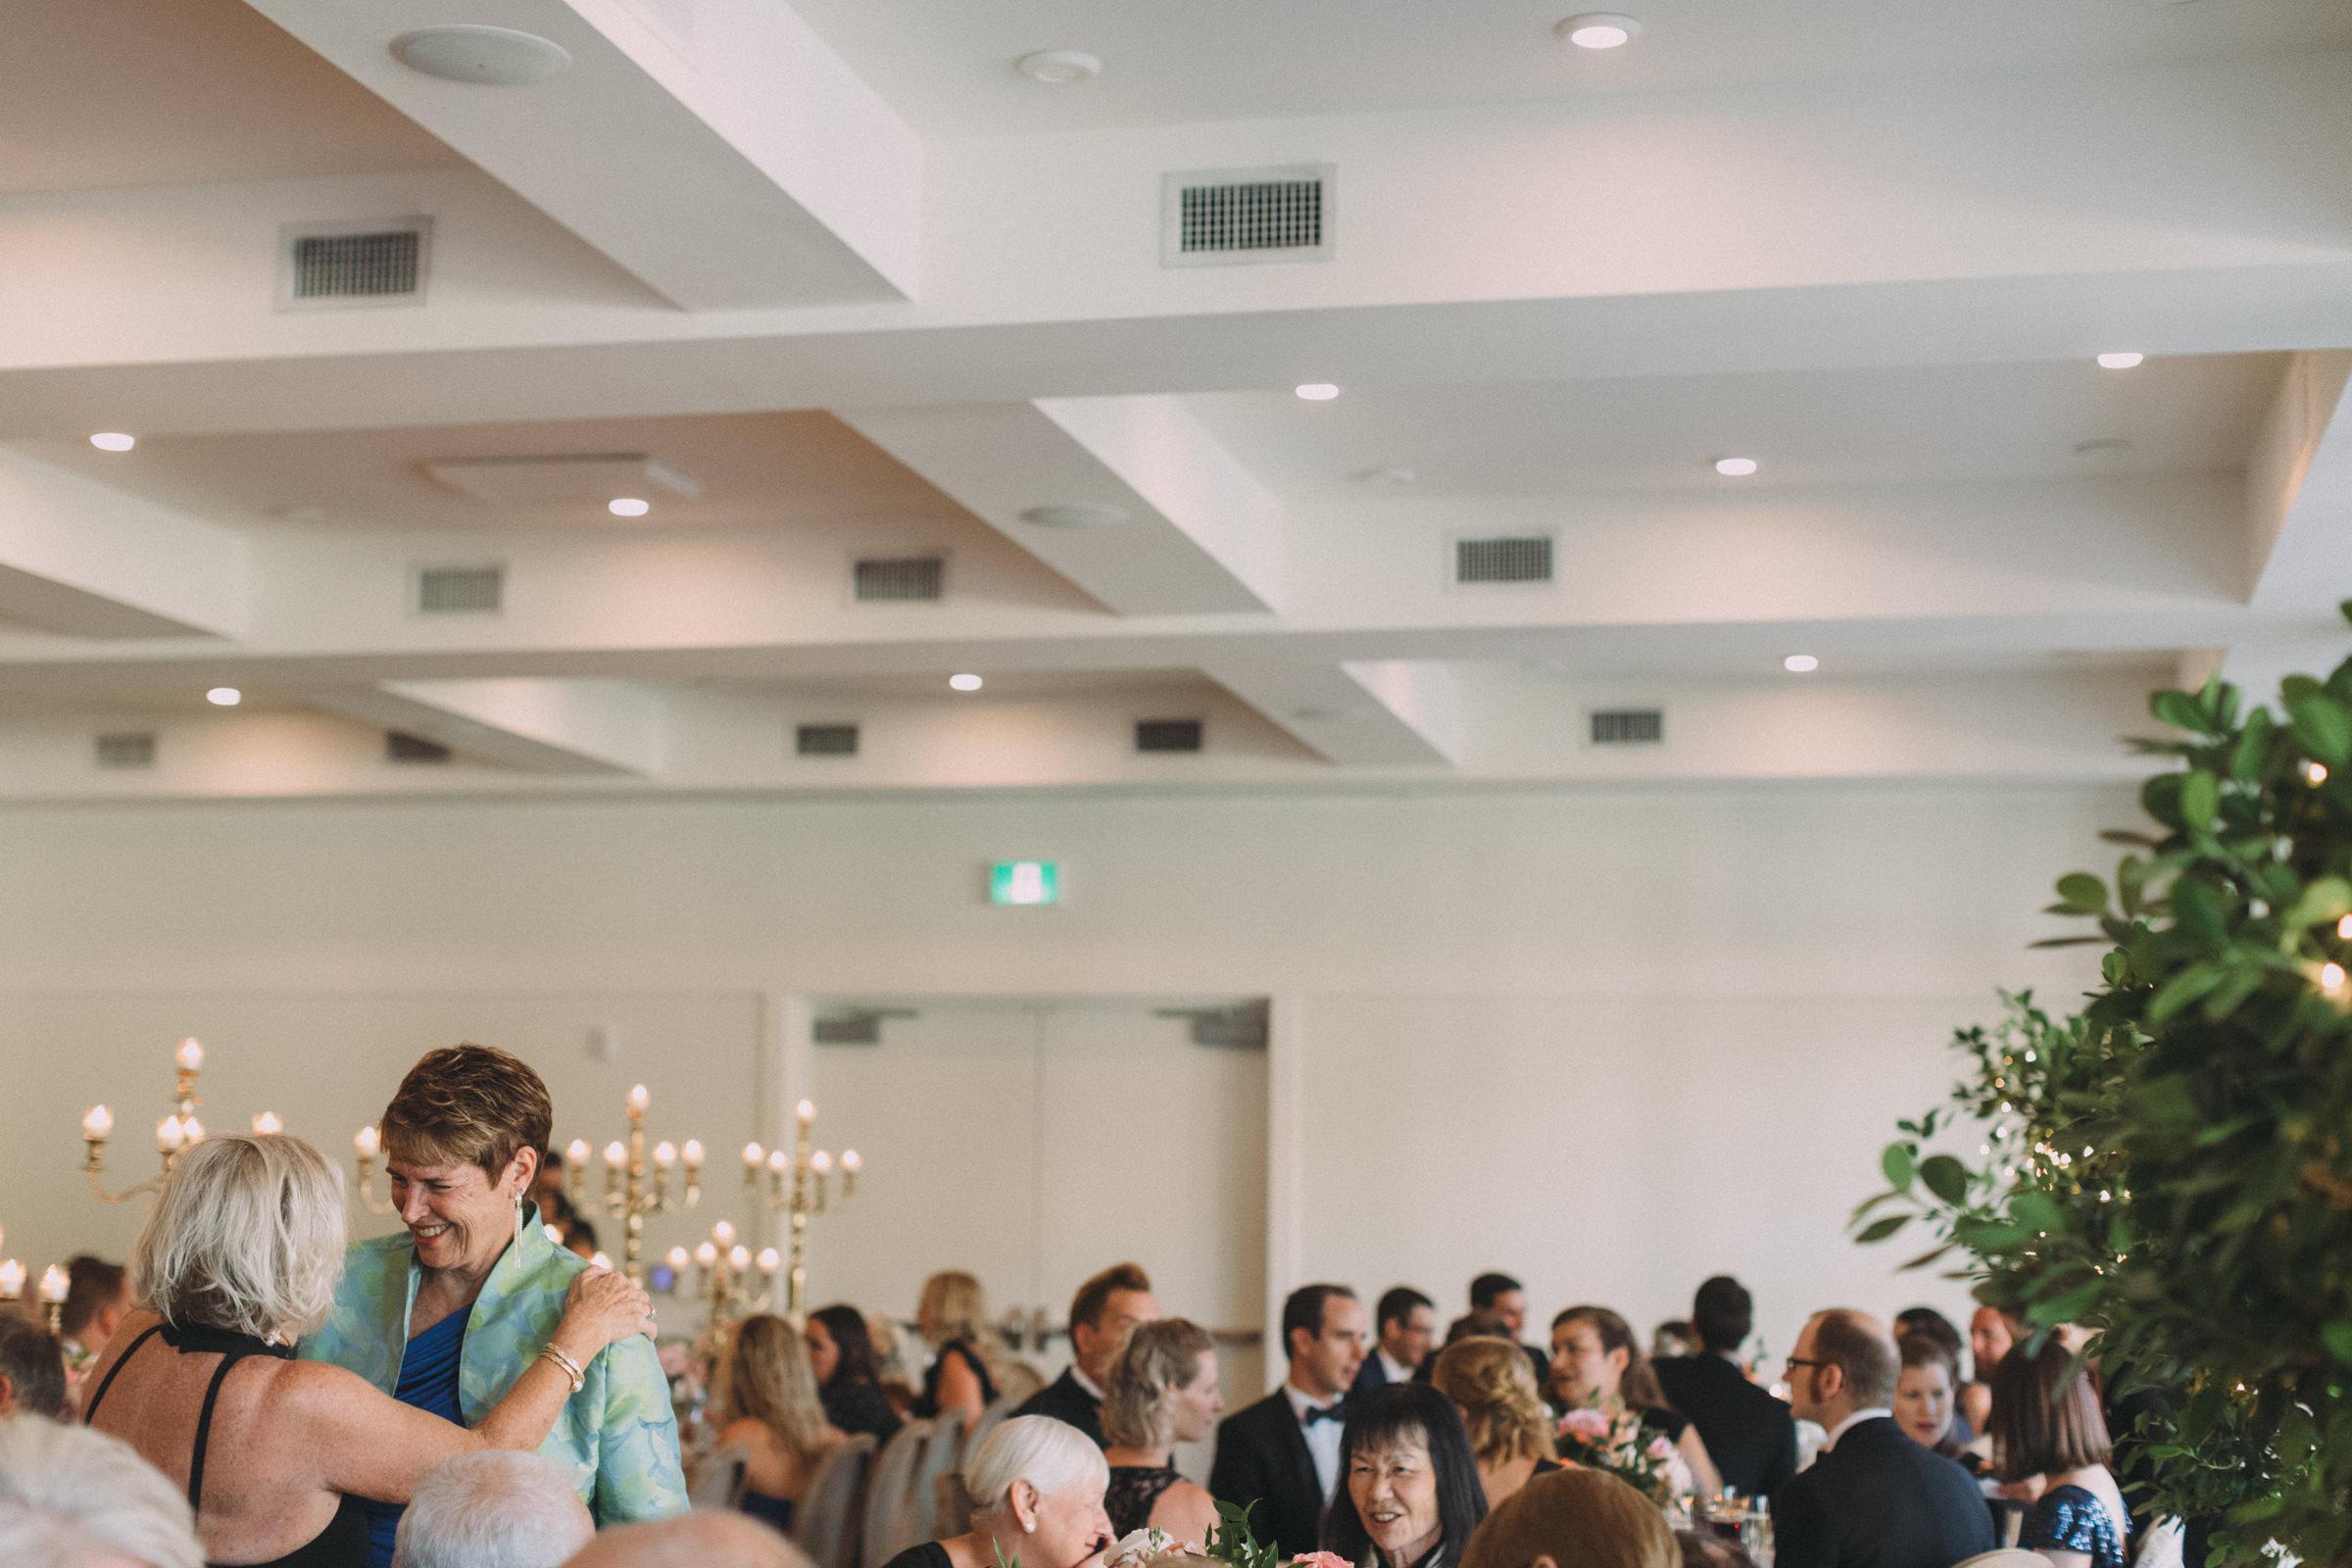 Langdon-Hall-wedding-photography-Cambridge-by-Sam-Wong-of-Visual-Cravings_Sarah-Ryan_51.jpg